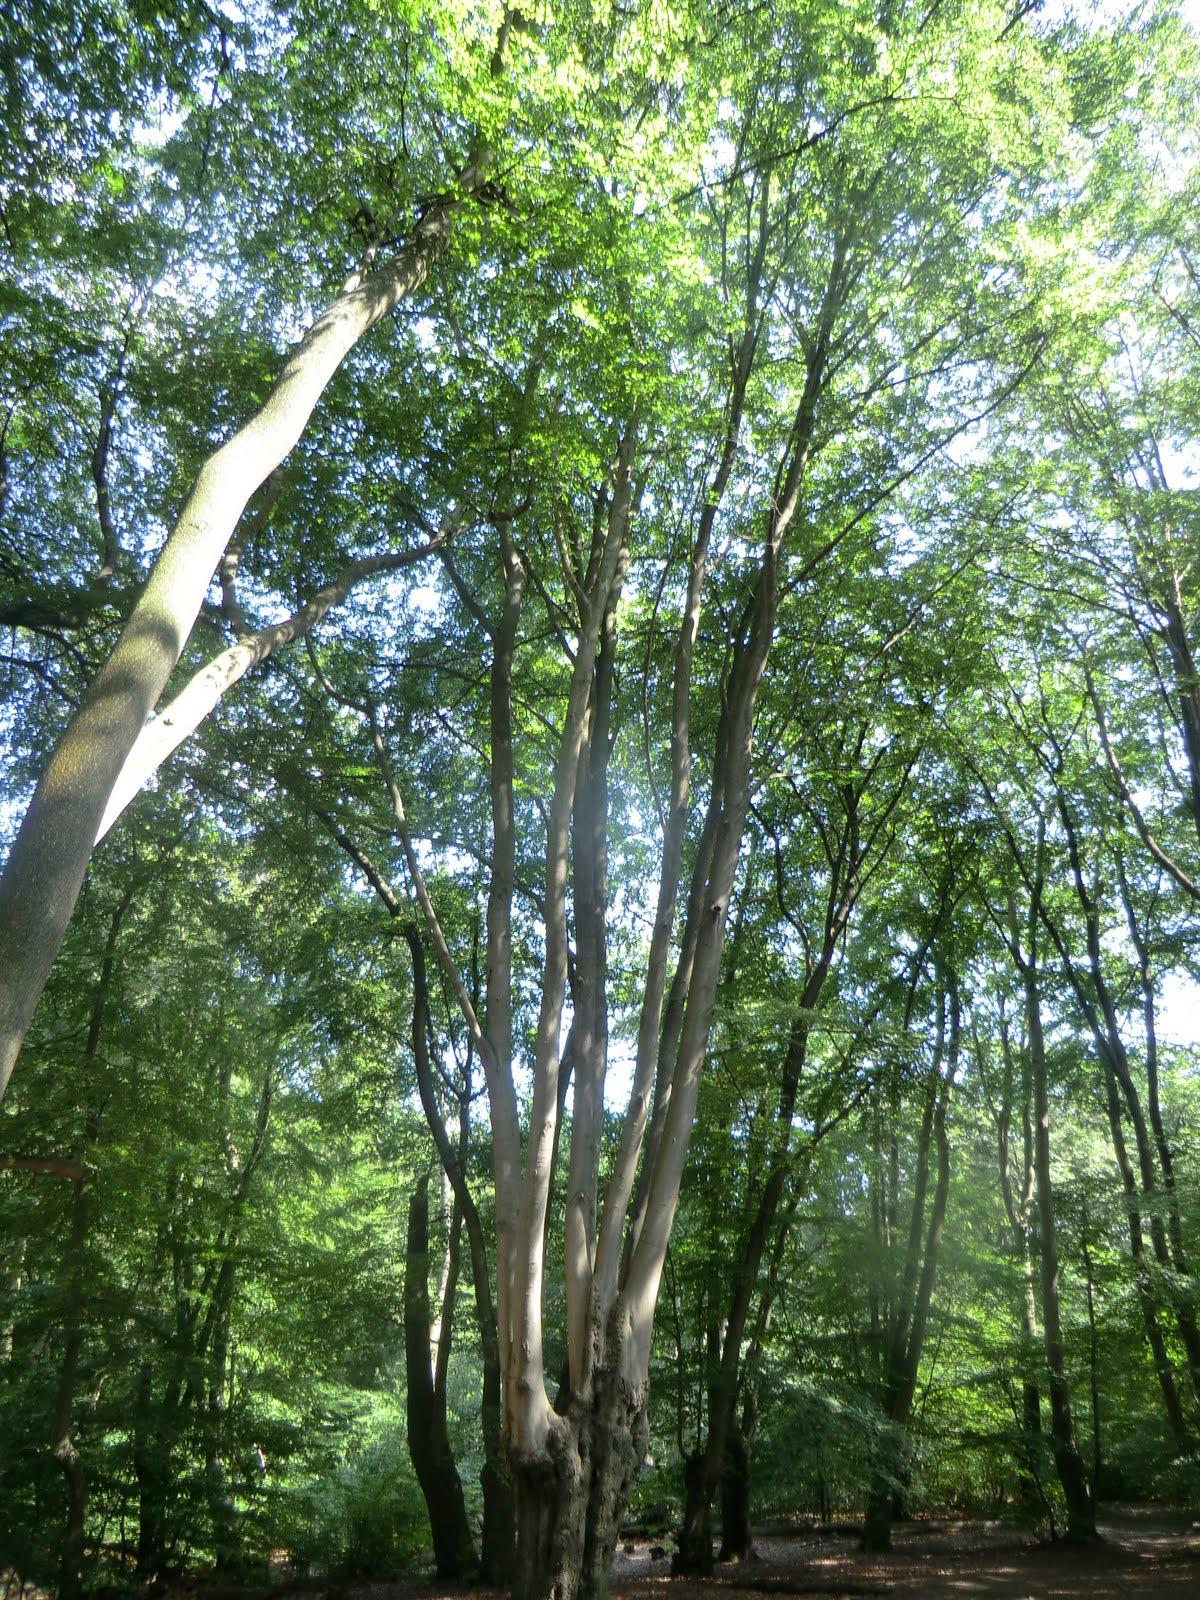 CIMG3214 Pollarded beech, Epping Forest